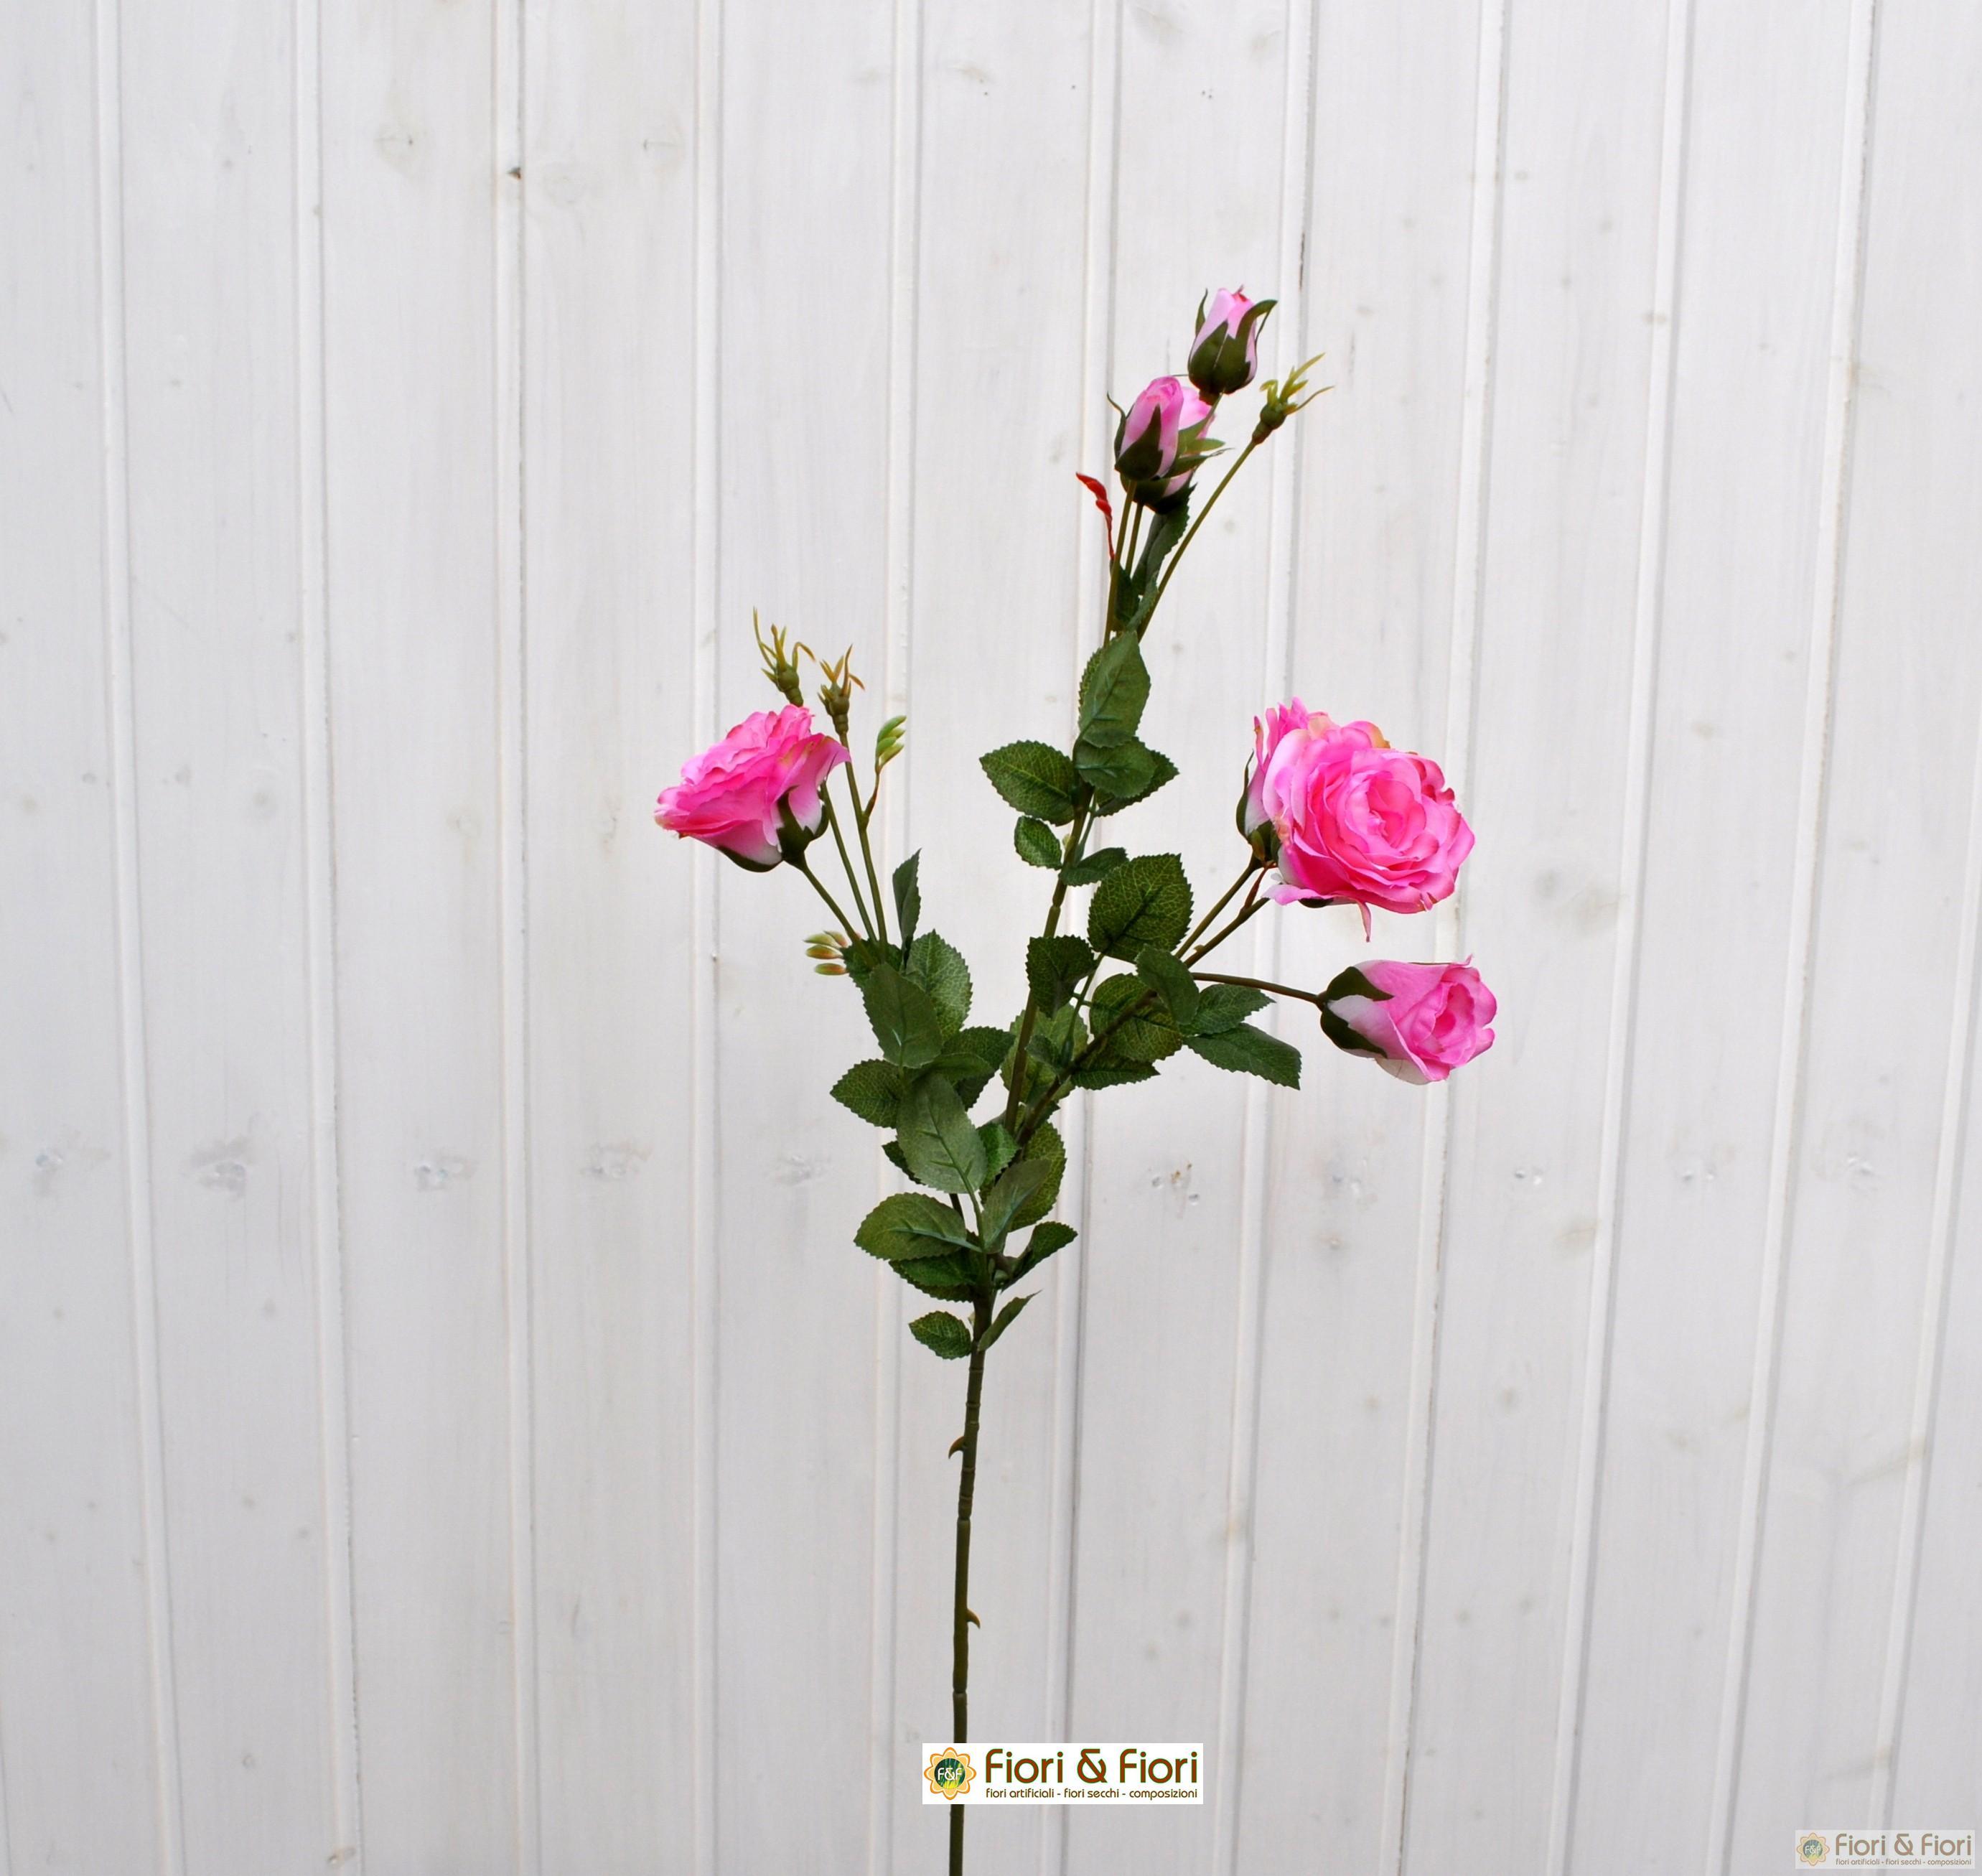 rosa henriette rosa